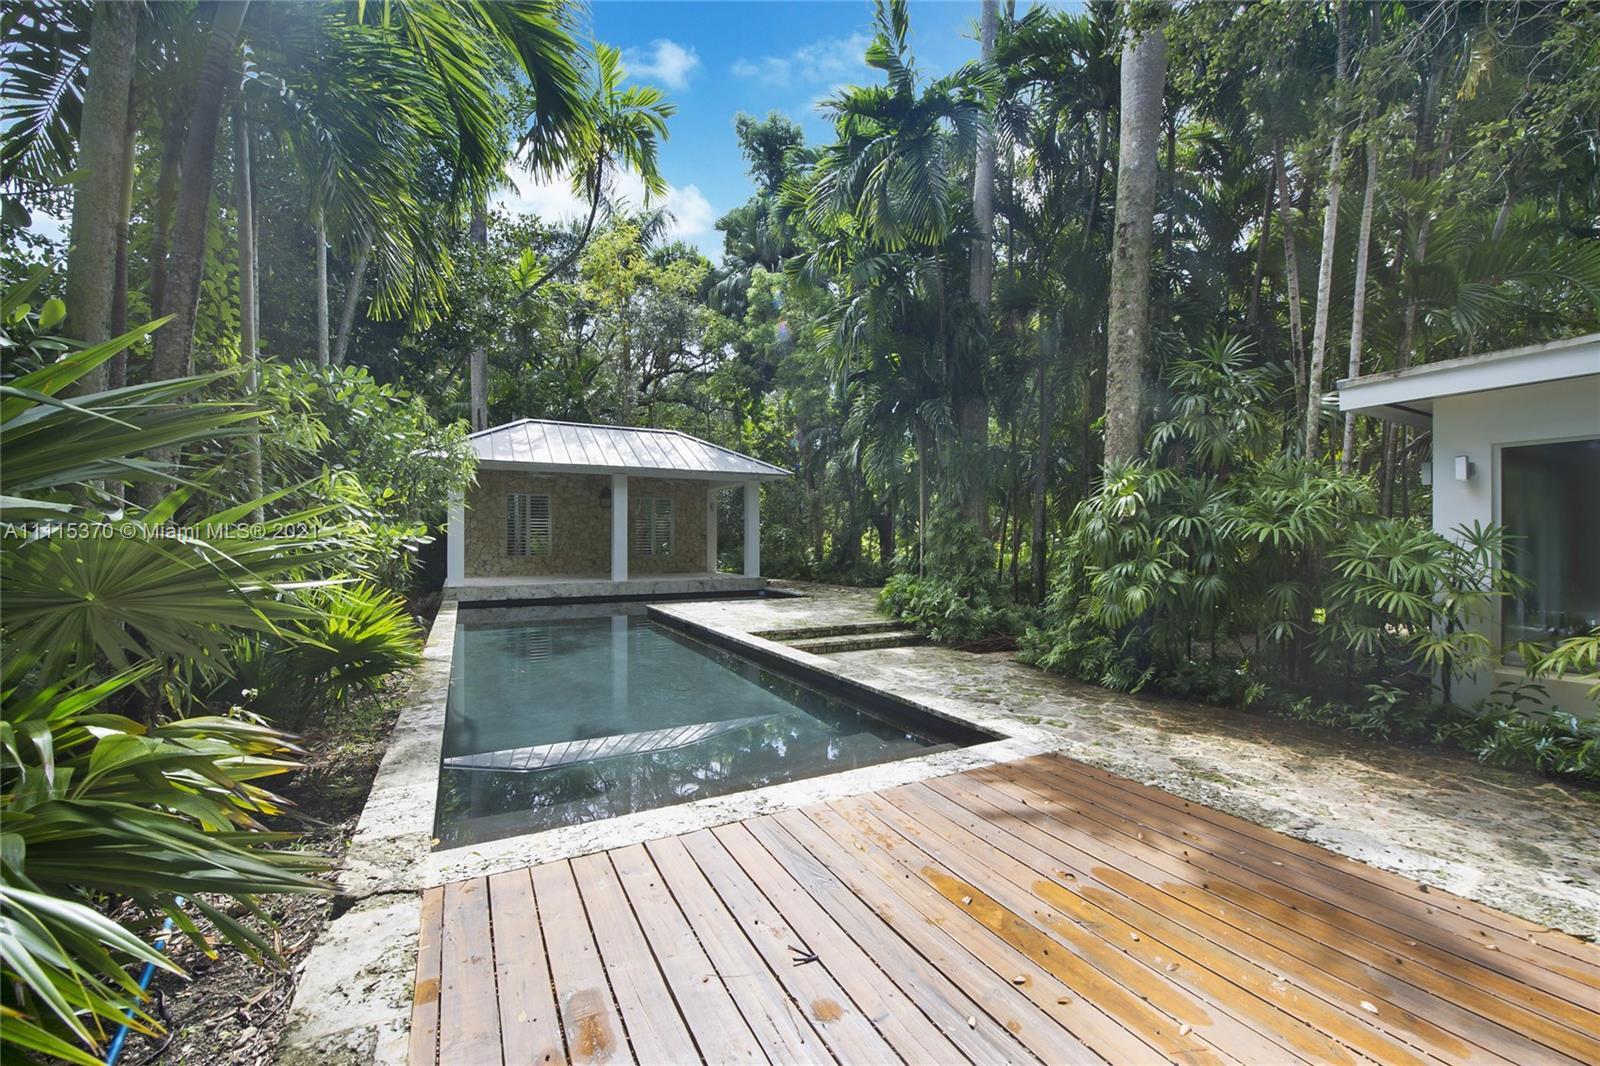 Single Family Home,For Rent,5671 Banyan Trl, Coral Gables, Florida 33156,Brickell,realty,broker,condos near me